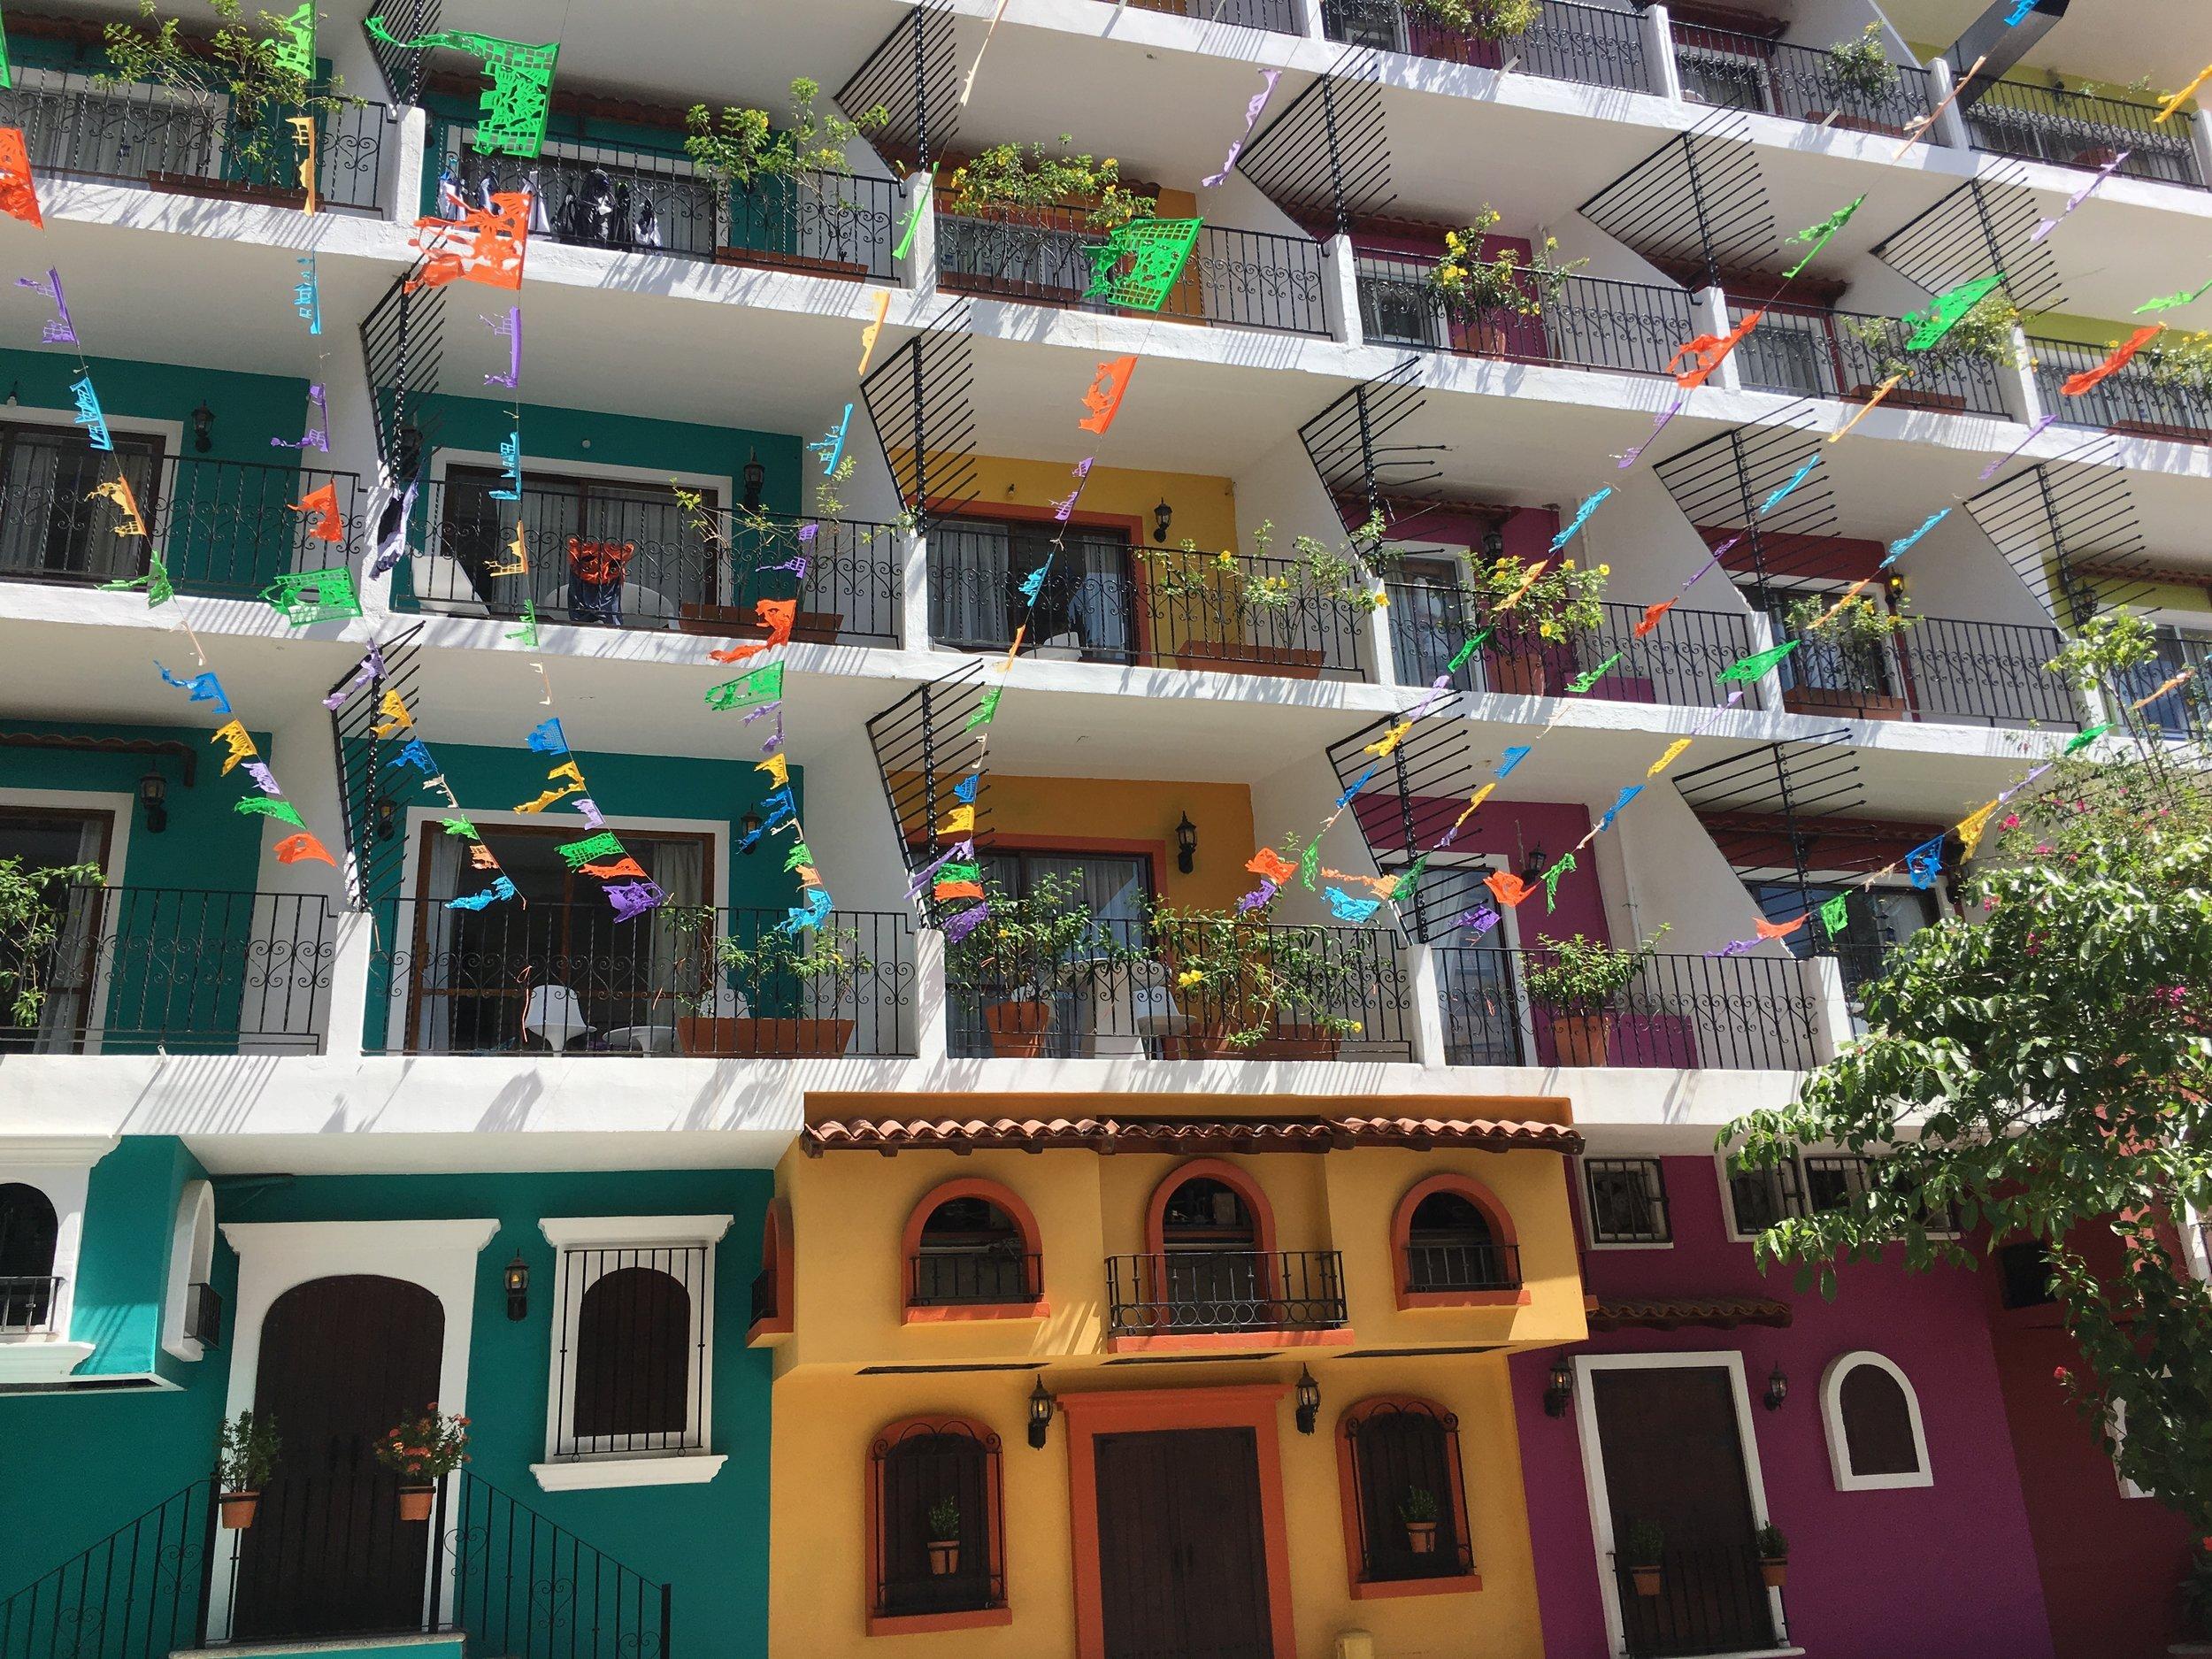 Take a colorful stroll through la zona romántica -